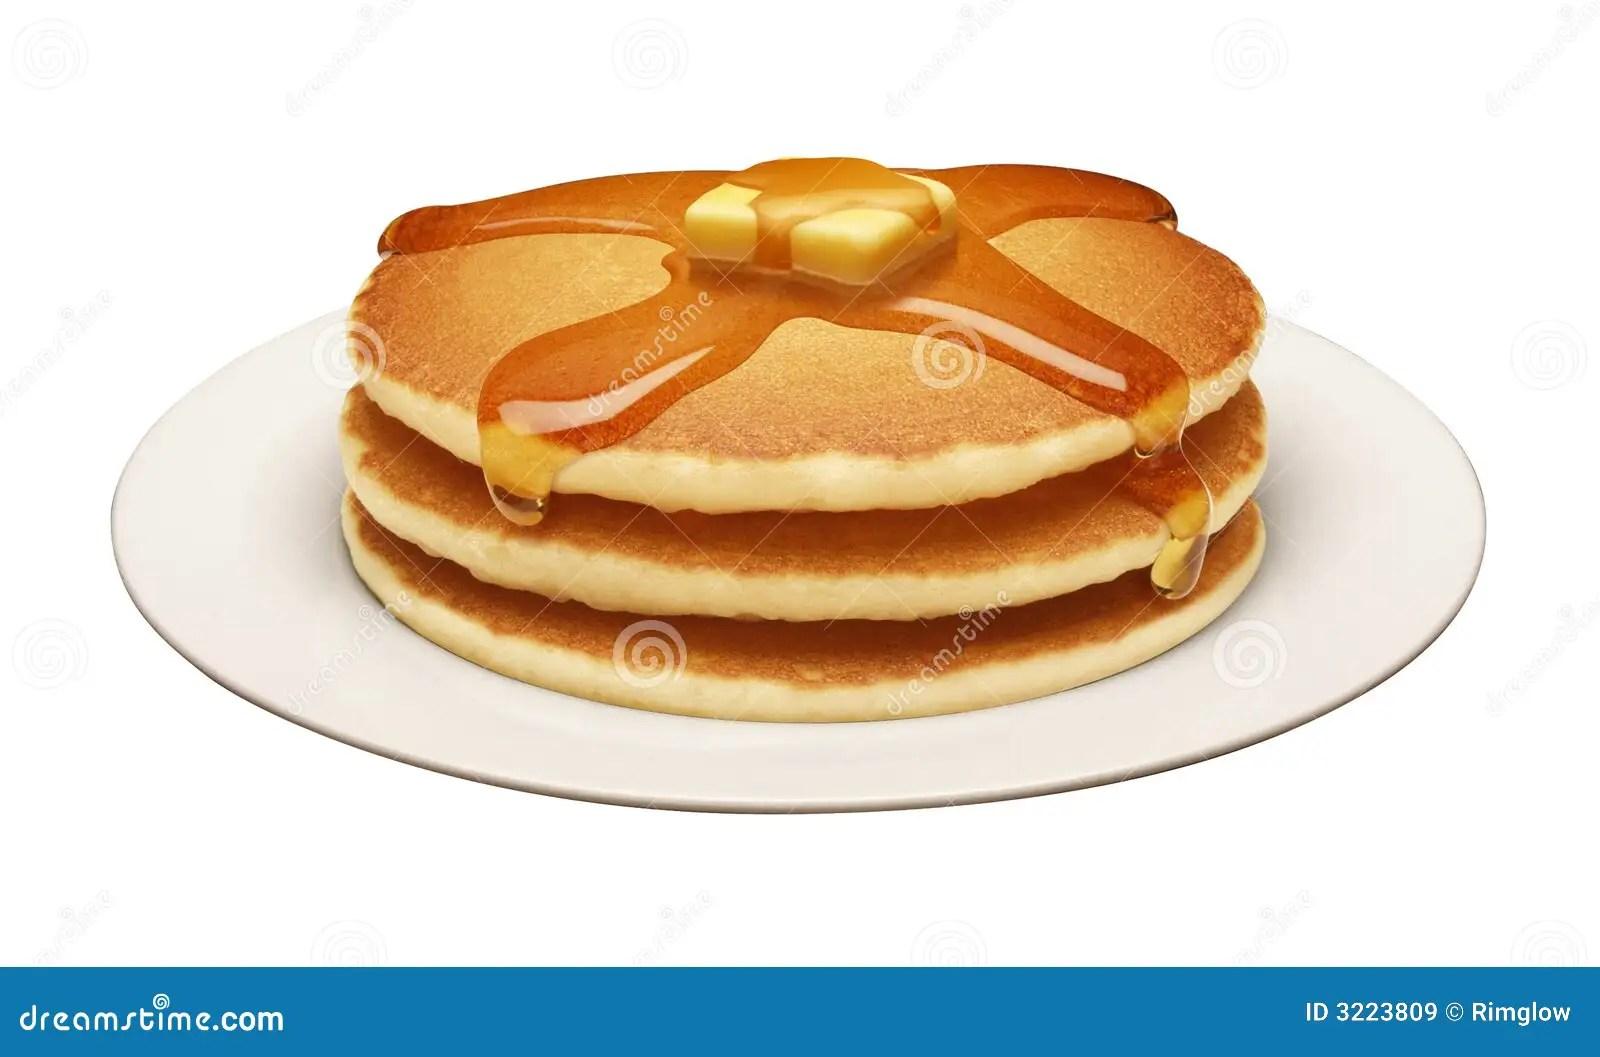 hight resolution of pancakes